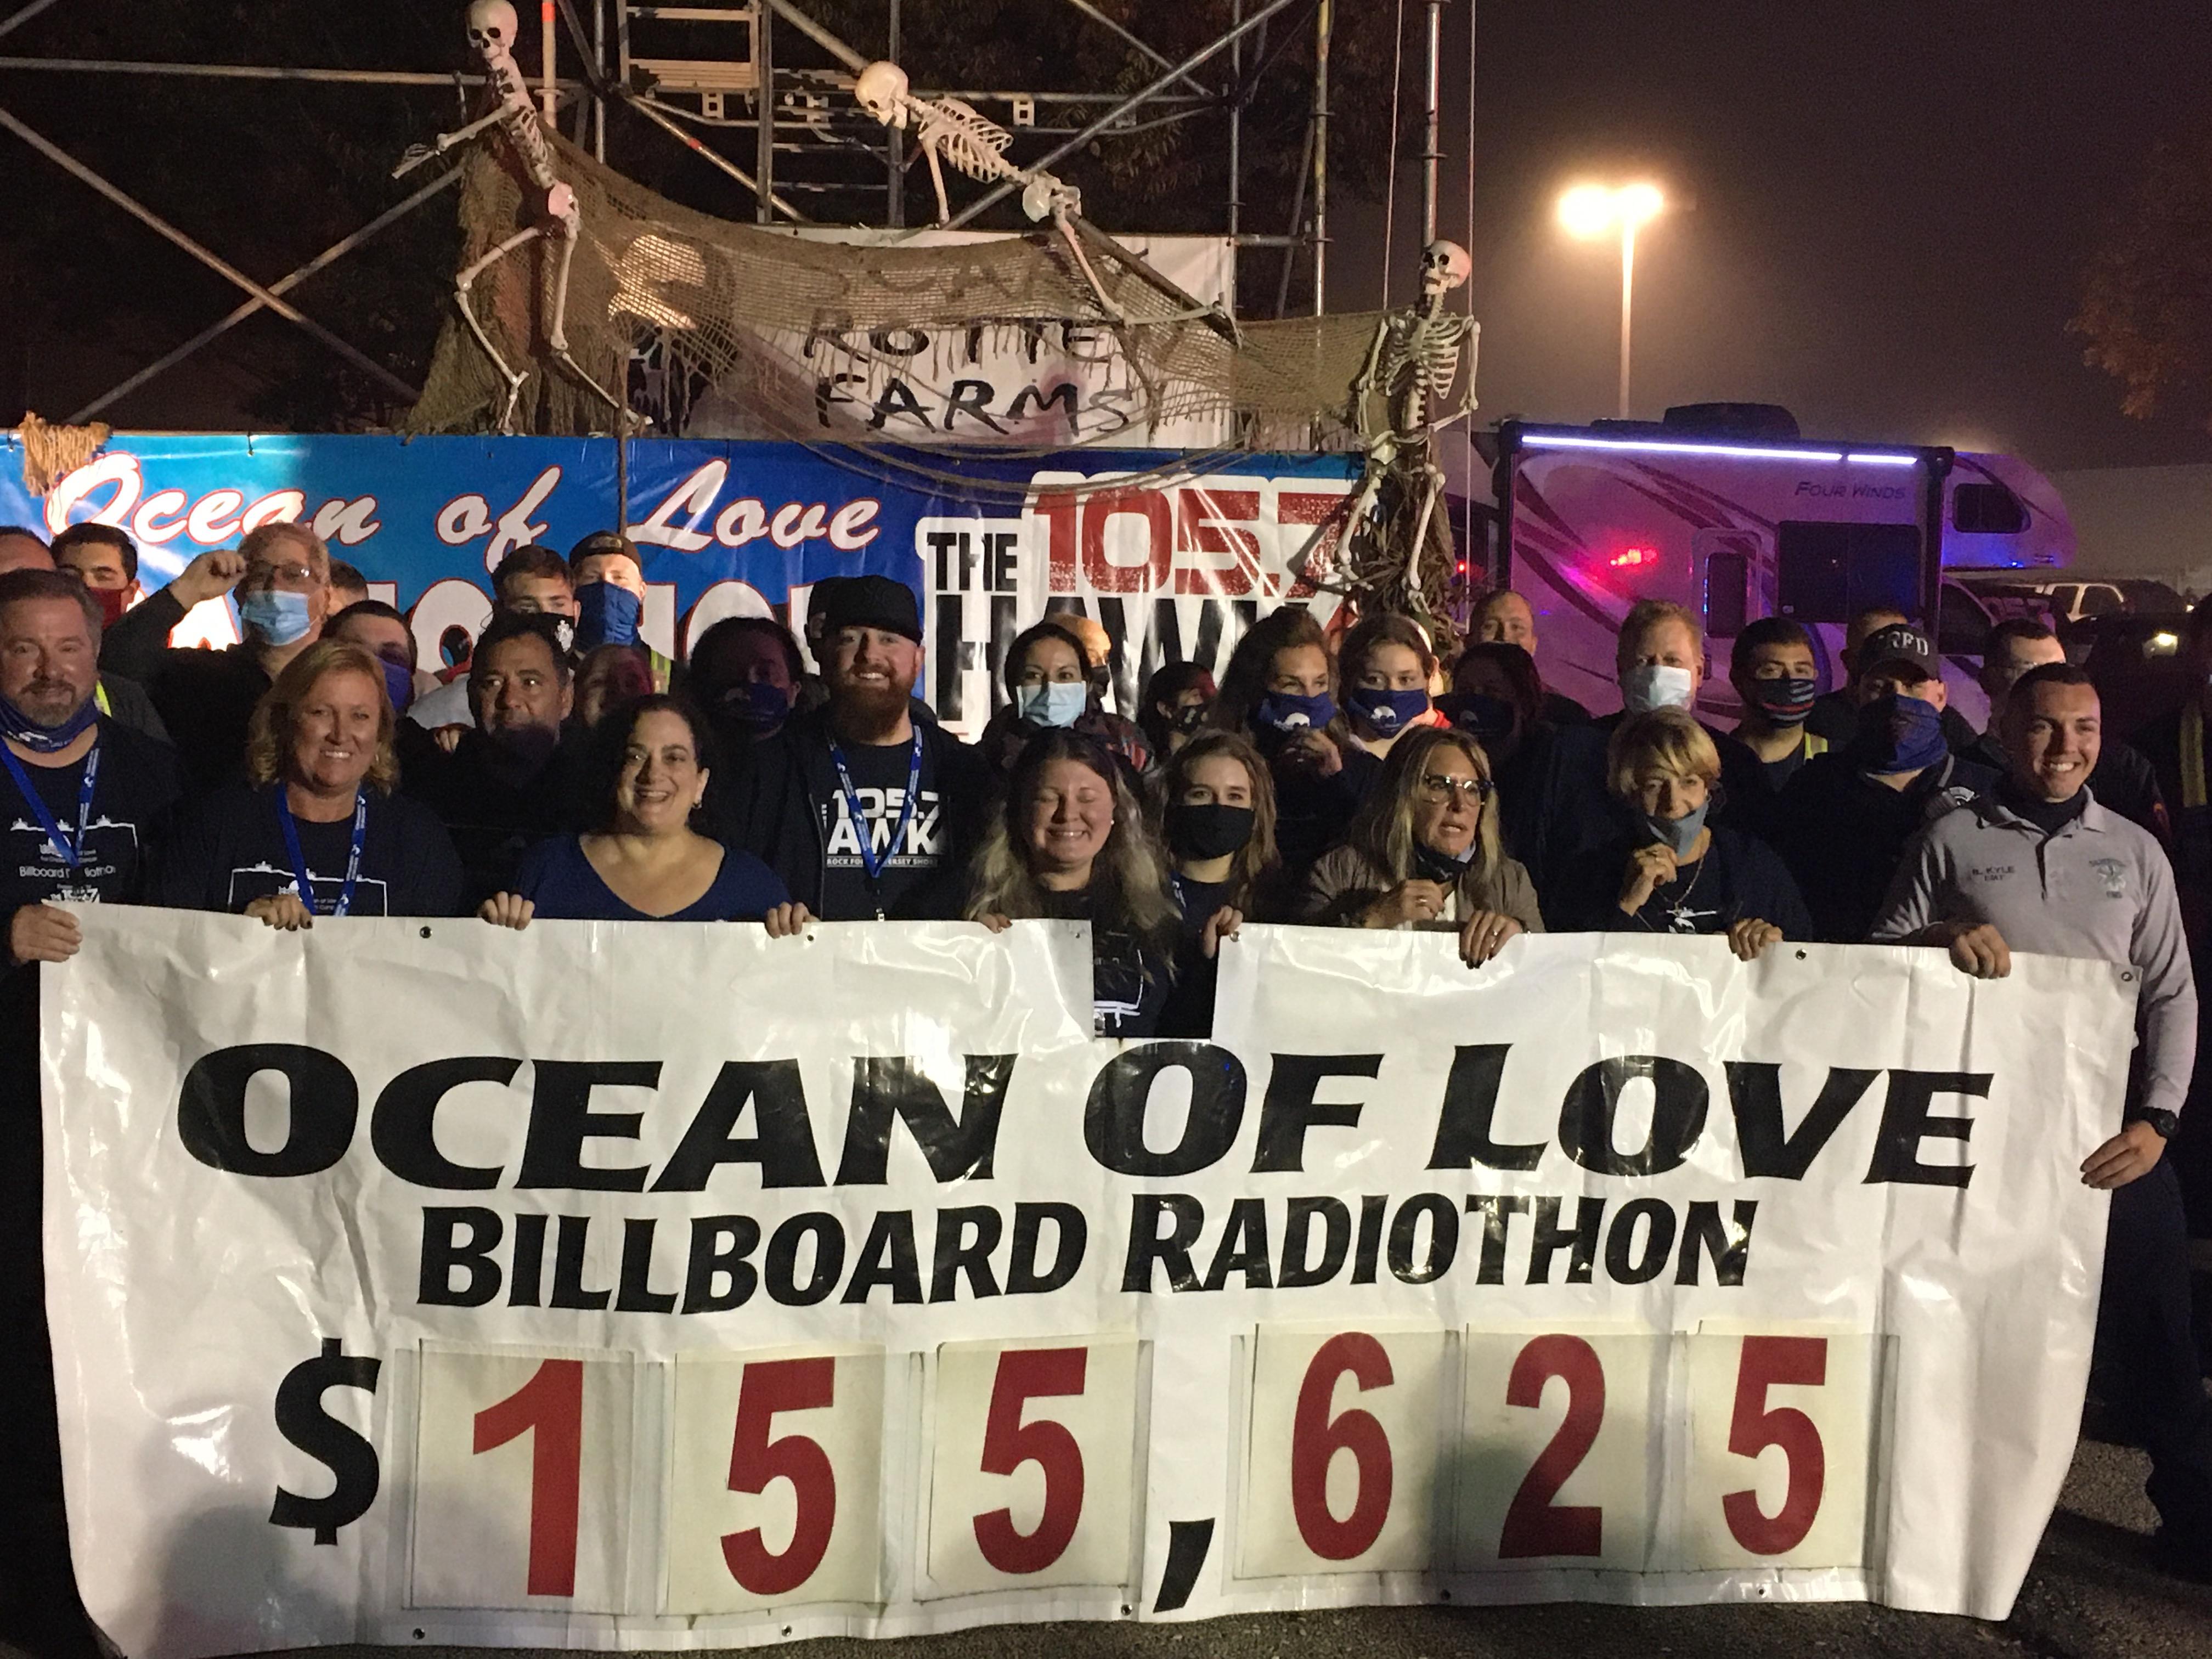 Billboard Radiothon Info | Ocean Of Love